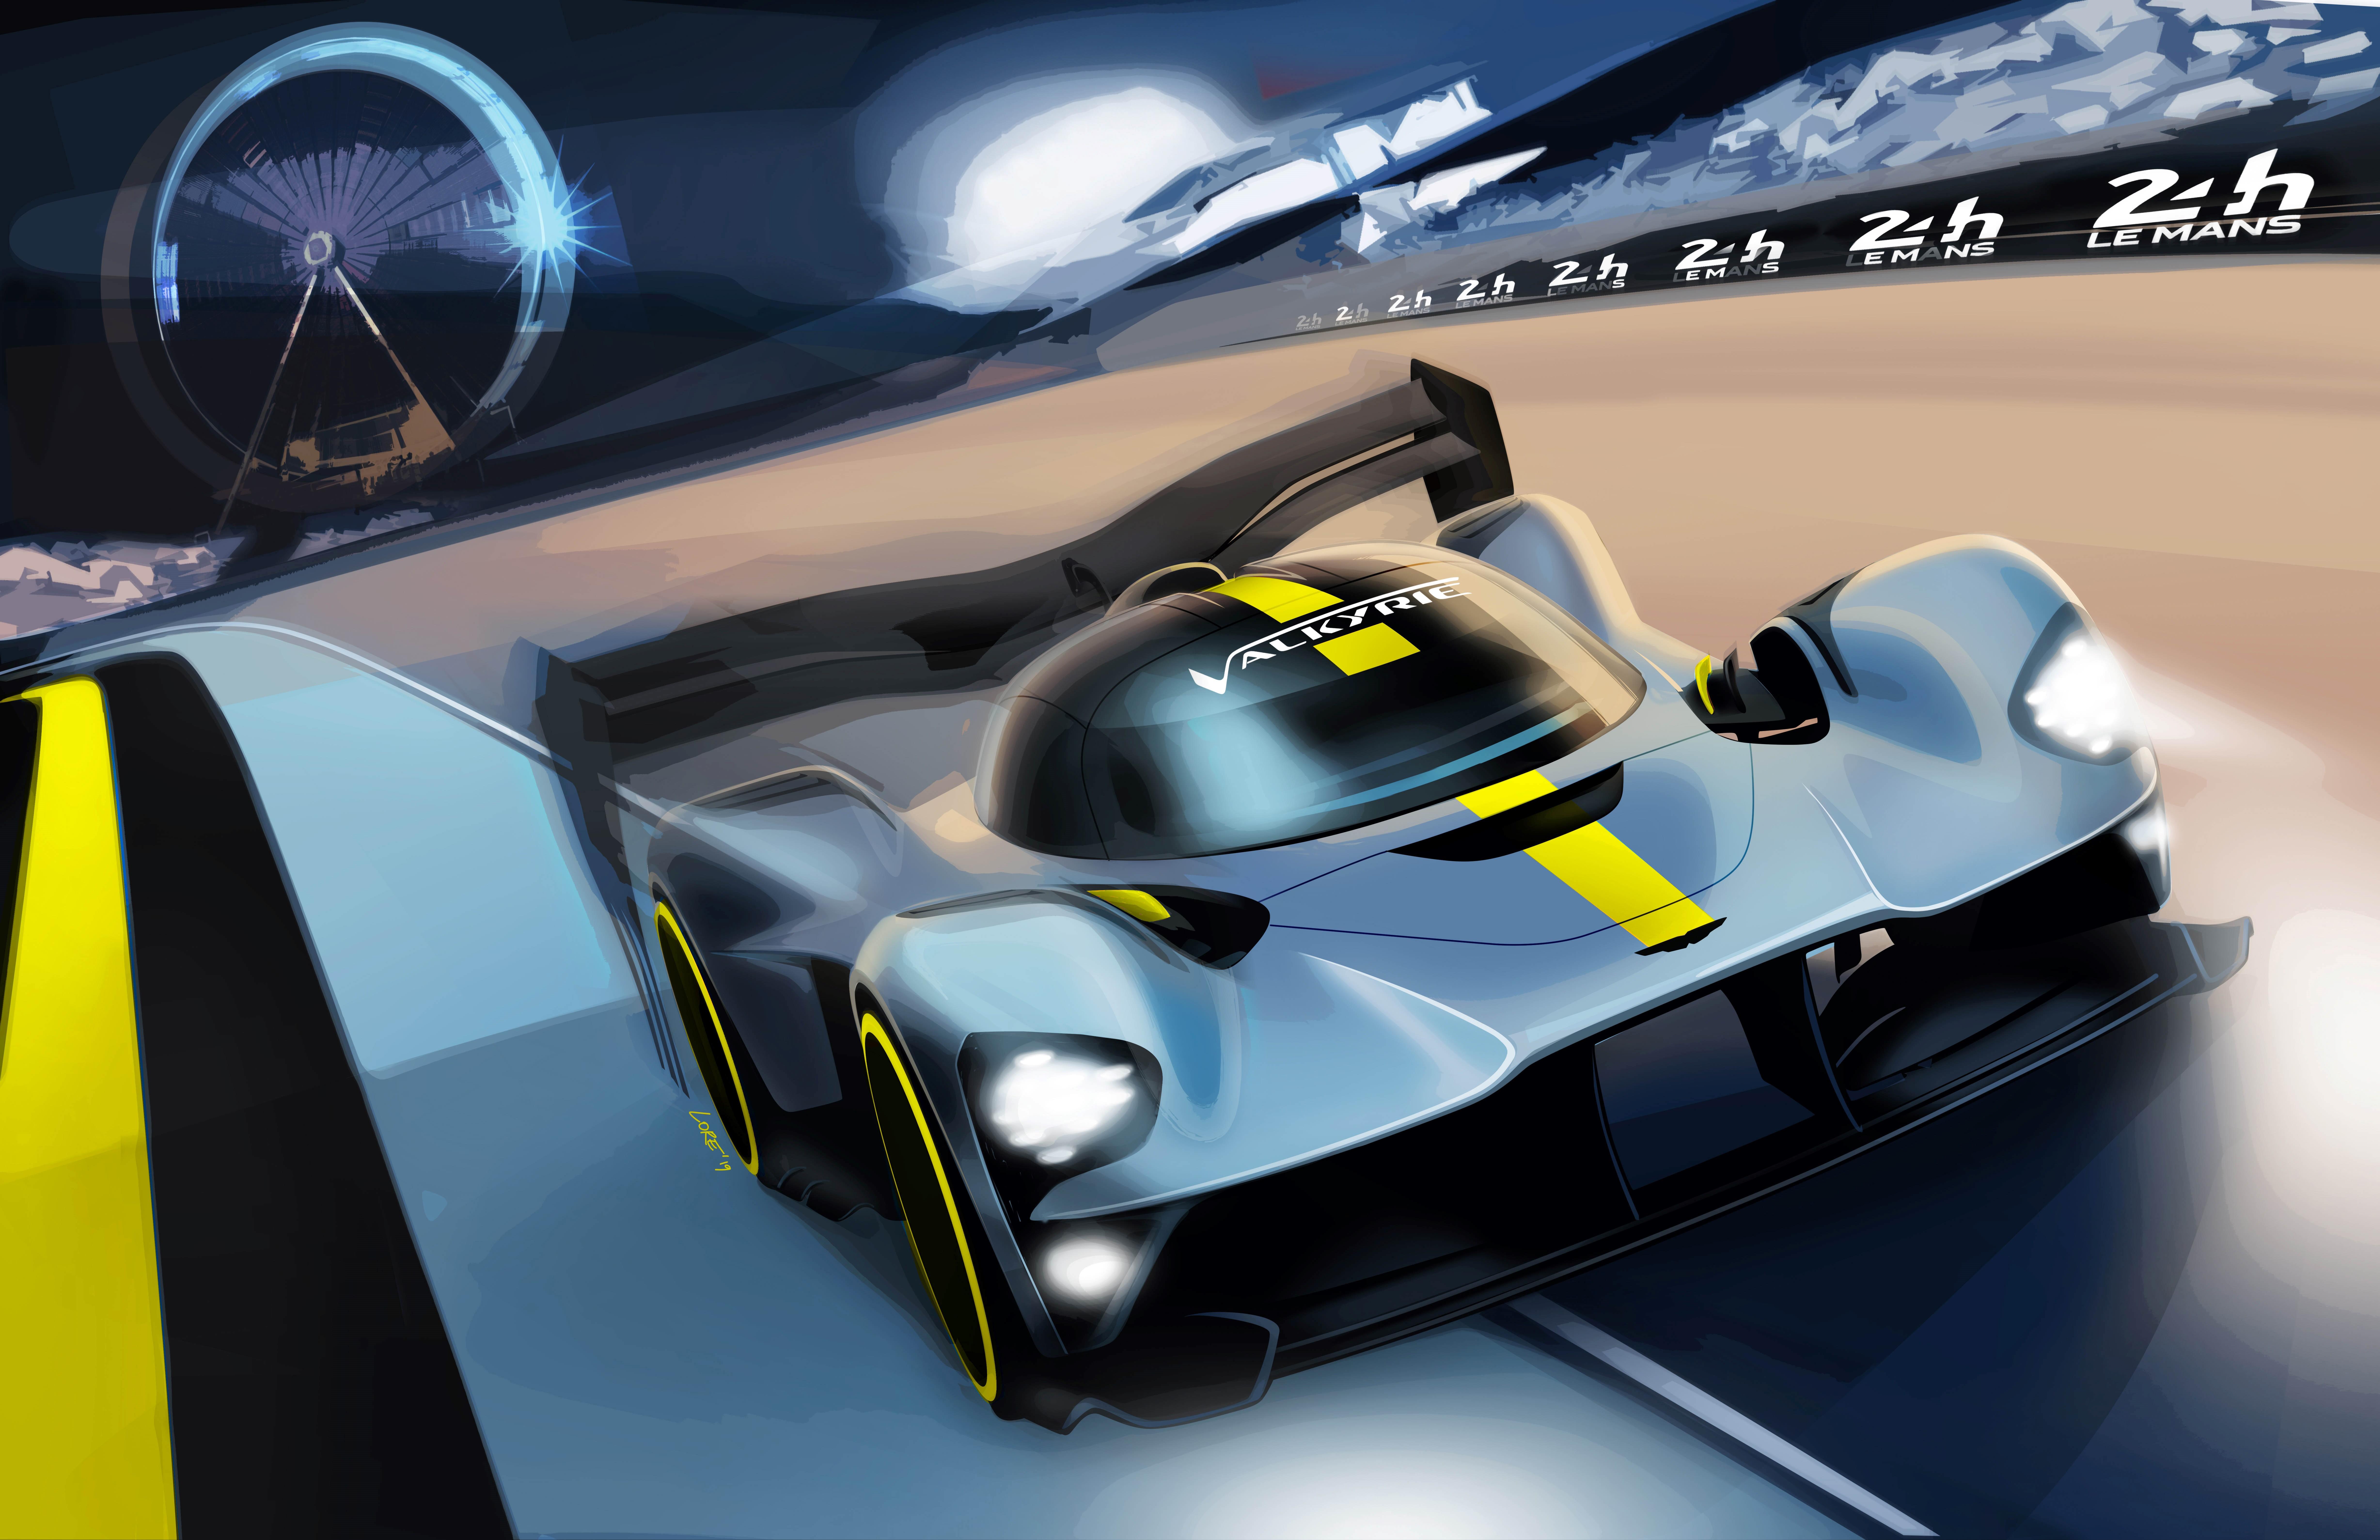 Fia Wec Aston Martin Valkyrie Ohne Hybridantrieb Gt Place Com